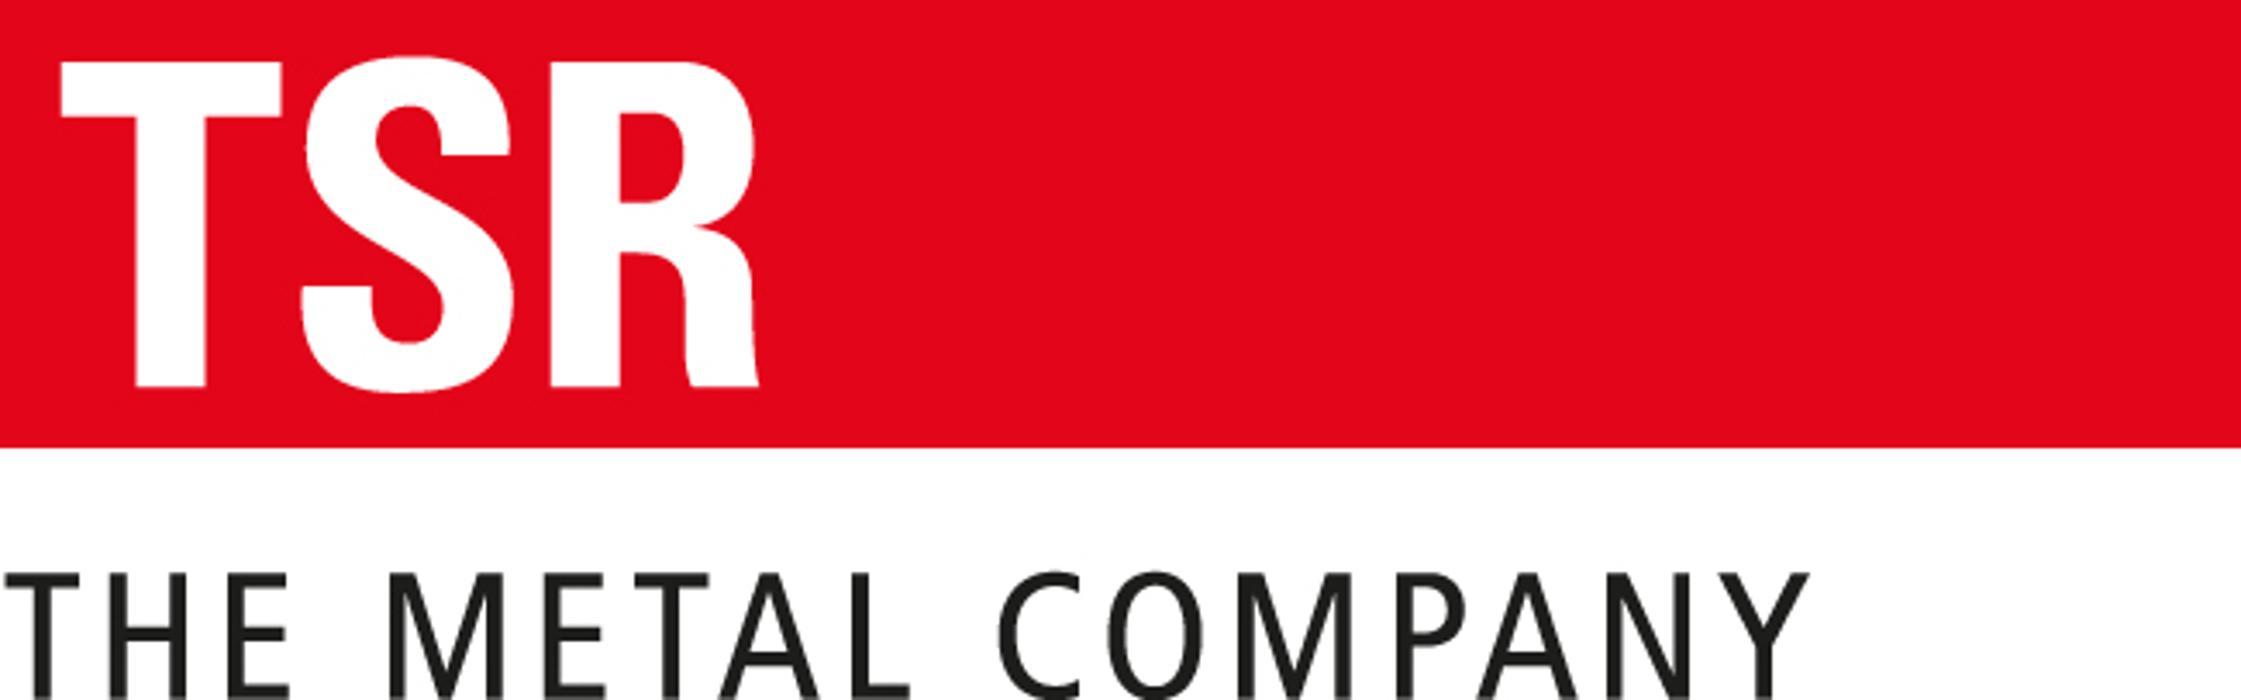 Logo von TSR Recycling GmbH & Co. KG